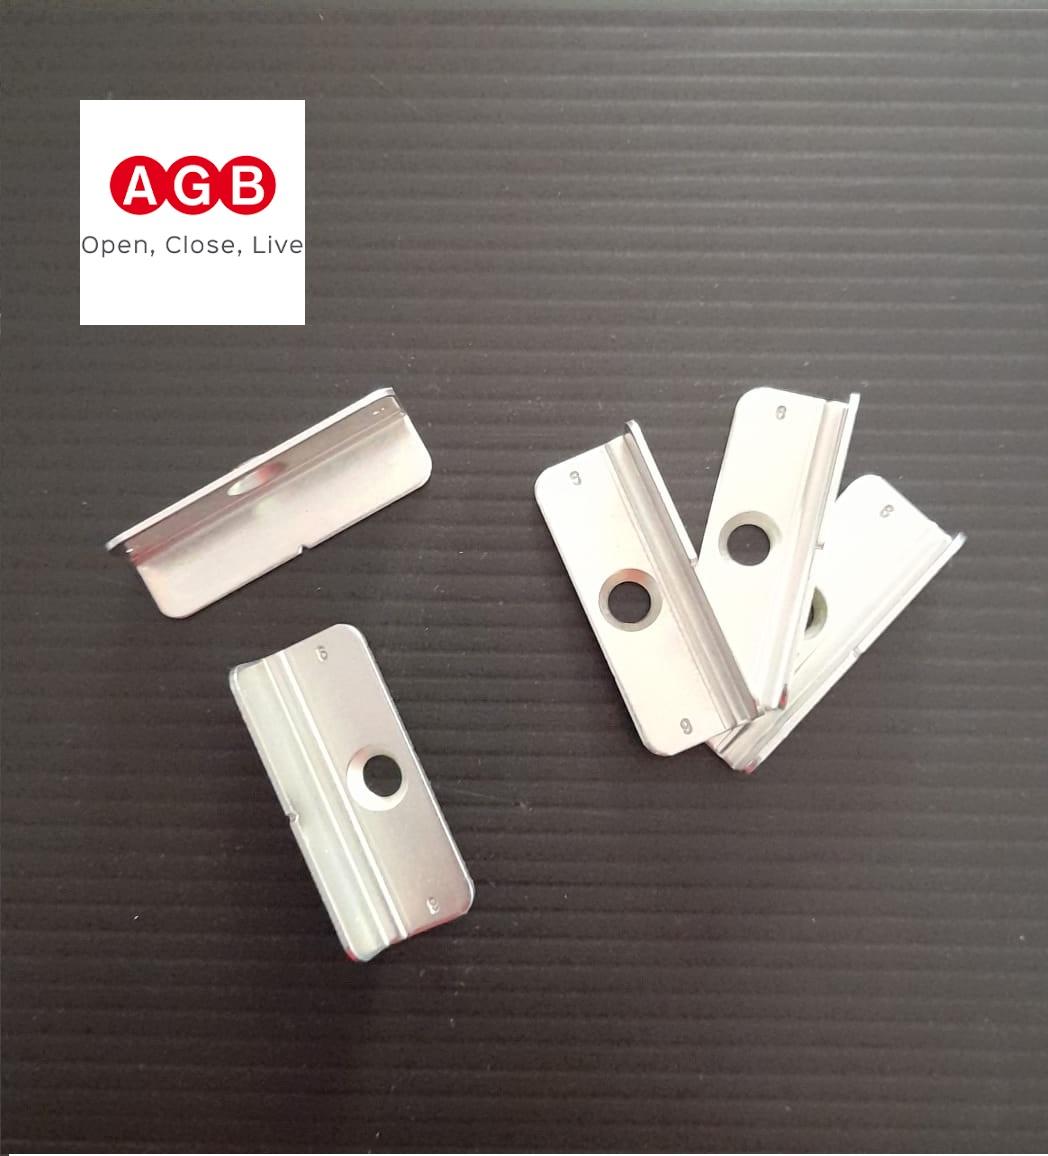 AGB incontro magnetico A501970900 ARTECH